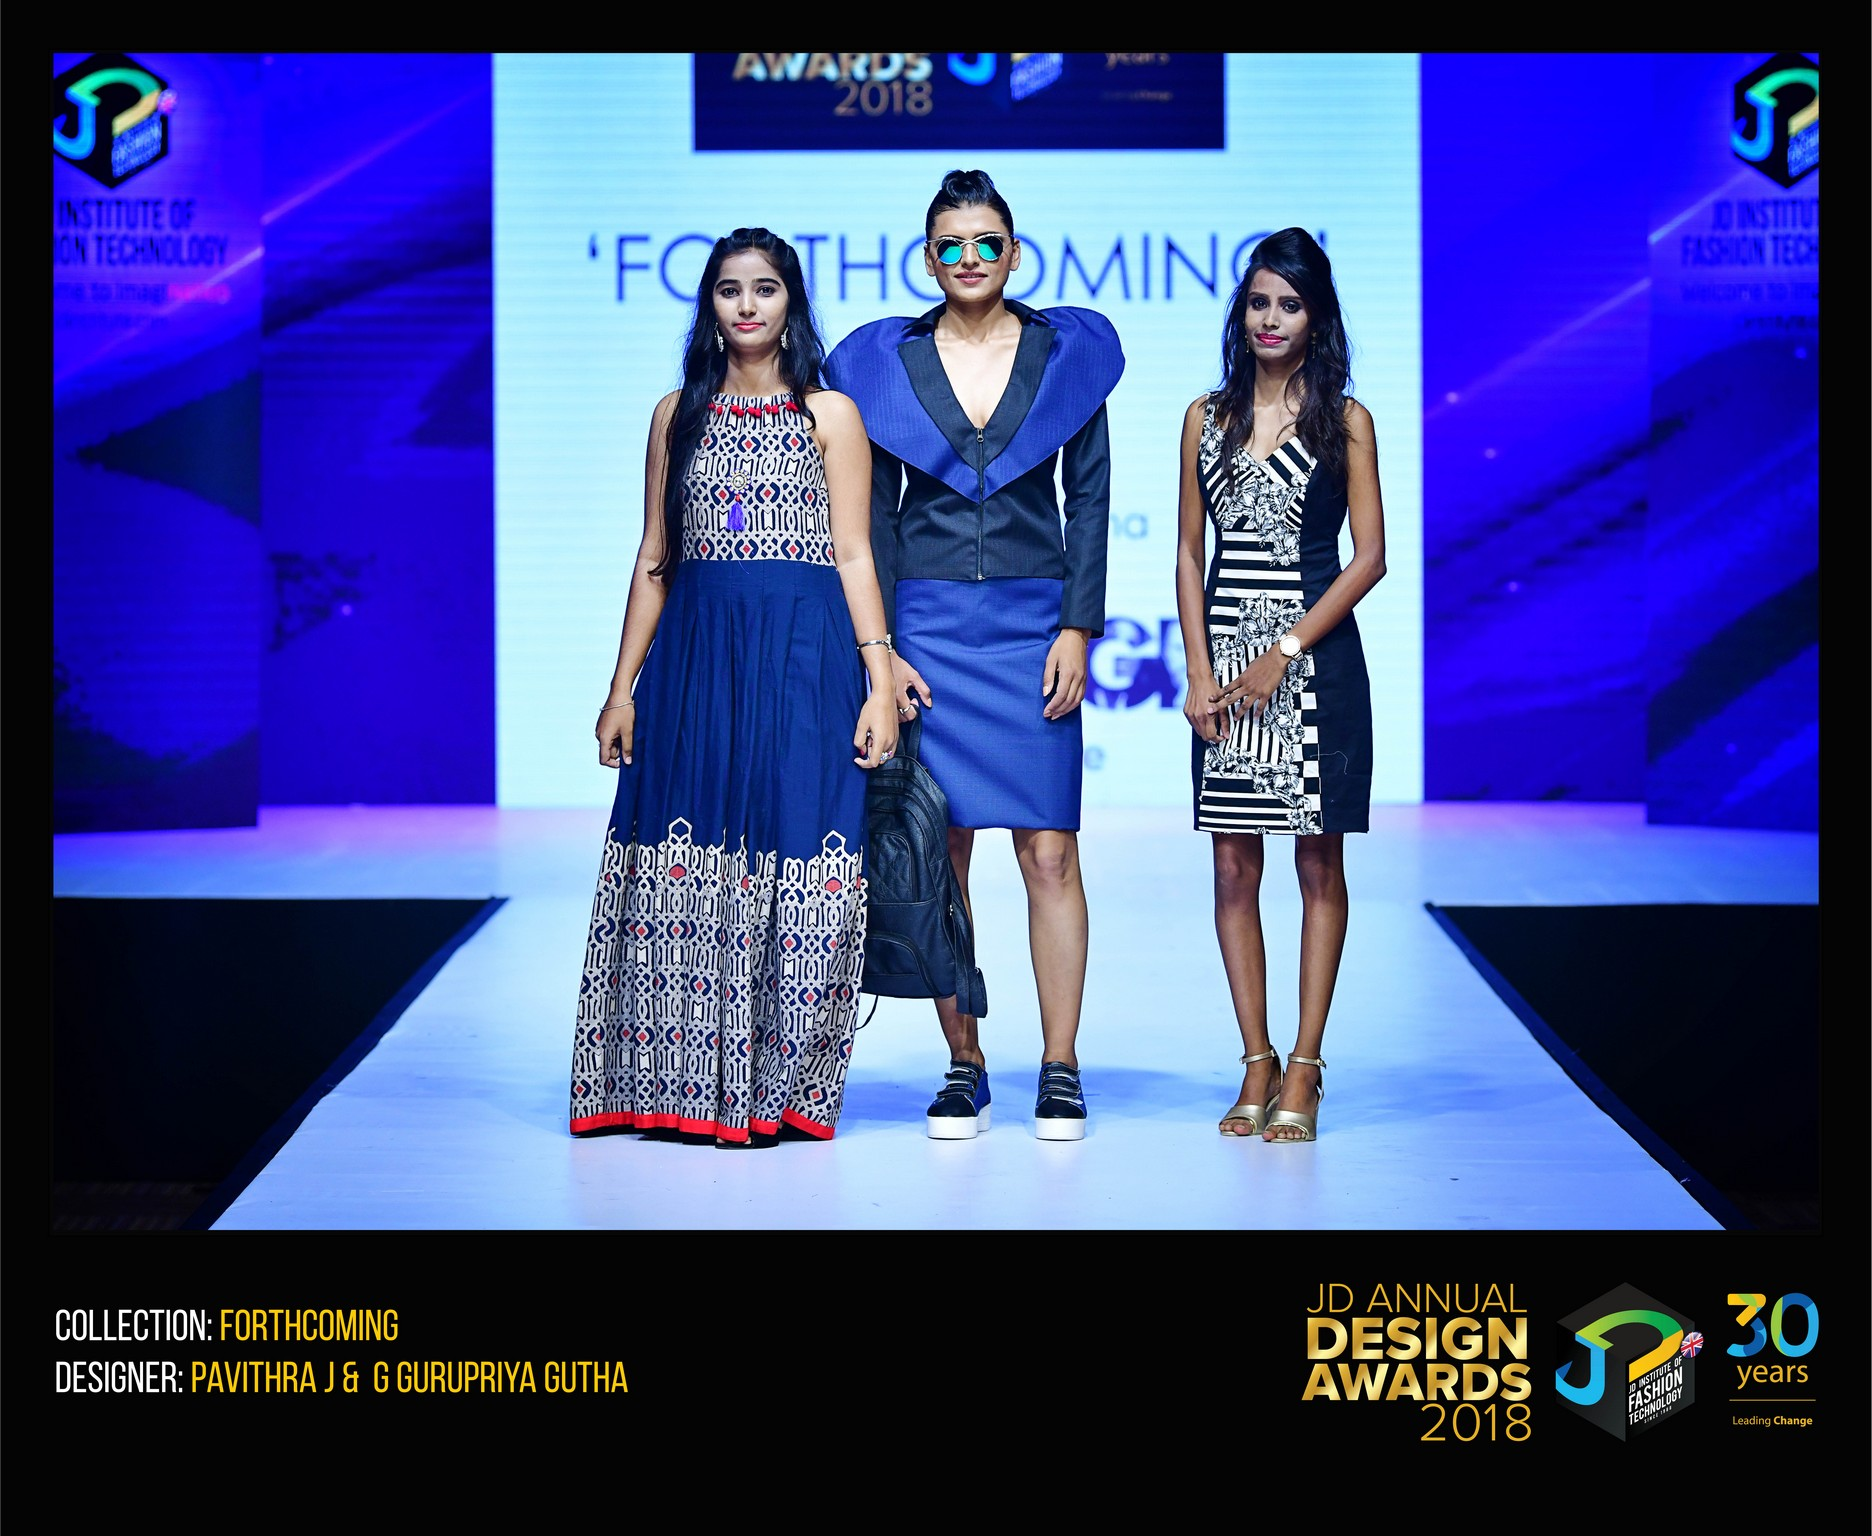 Forthcoming – Change – JD Annual Design Awards 2018 | Designer: Pavithra and Priya | Photography : Jerin Nath (@jerin_nath) forthcoming - FORTHCOMING 8 - Forthcoming – Change – JD Annual Design Awards 2018